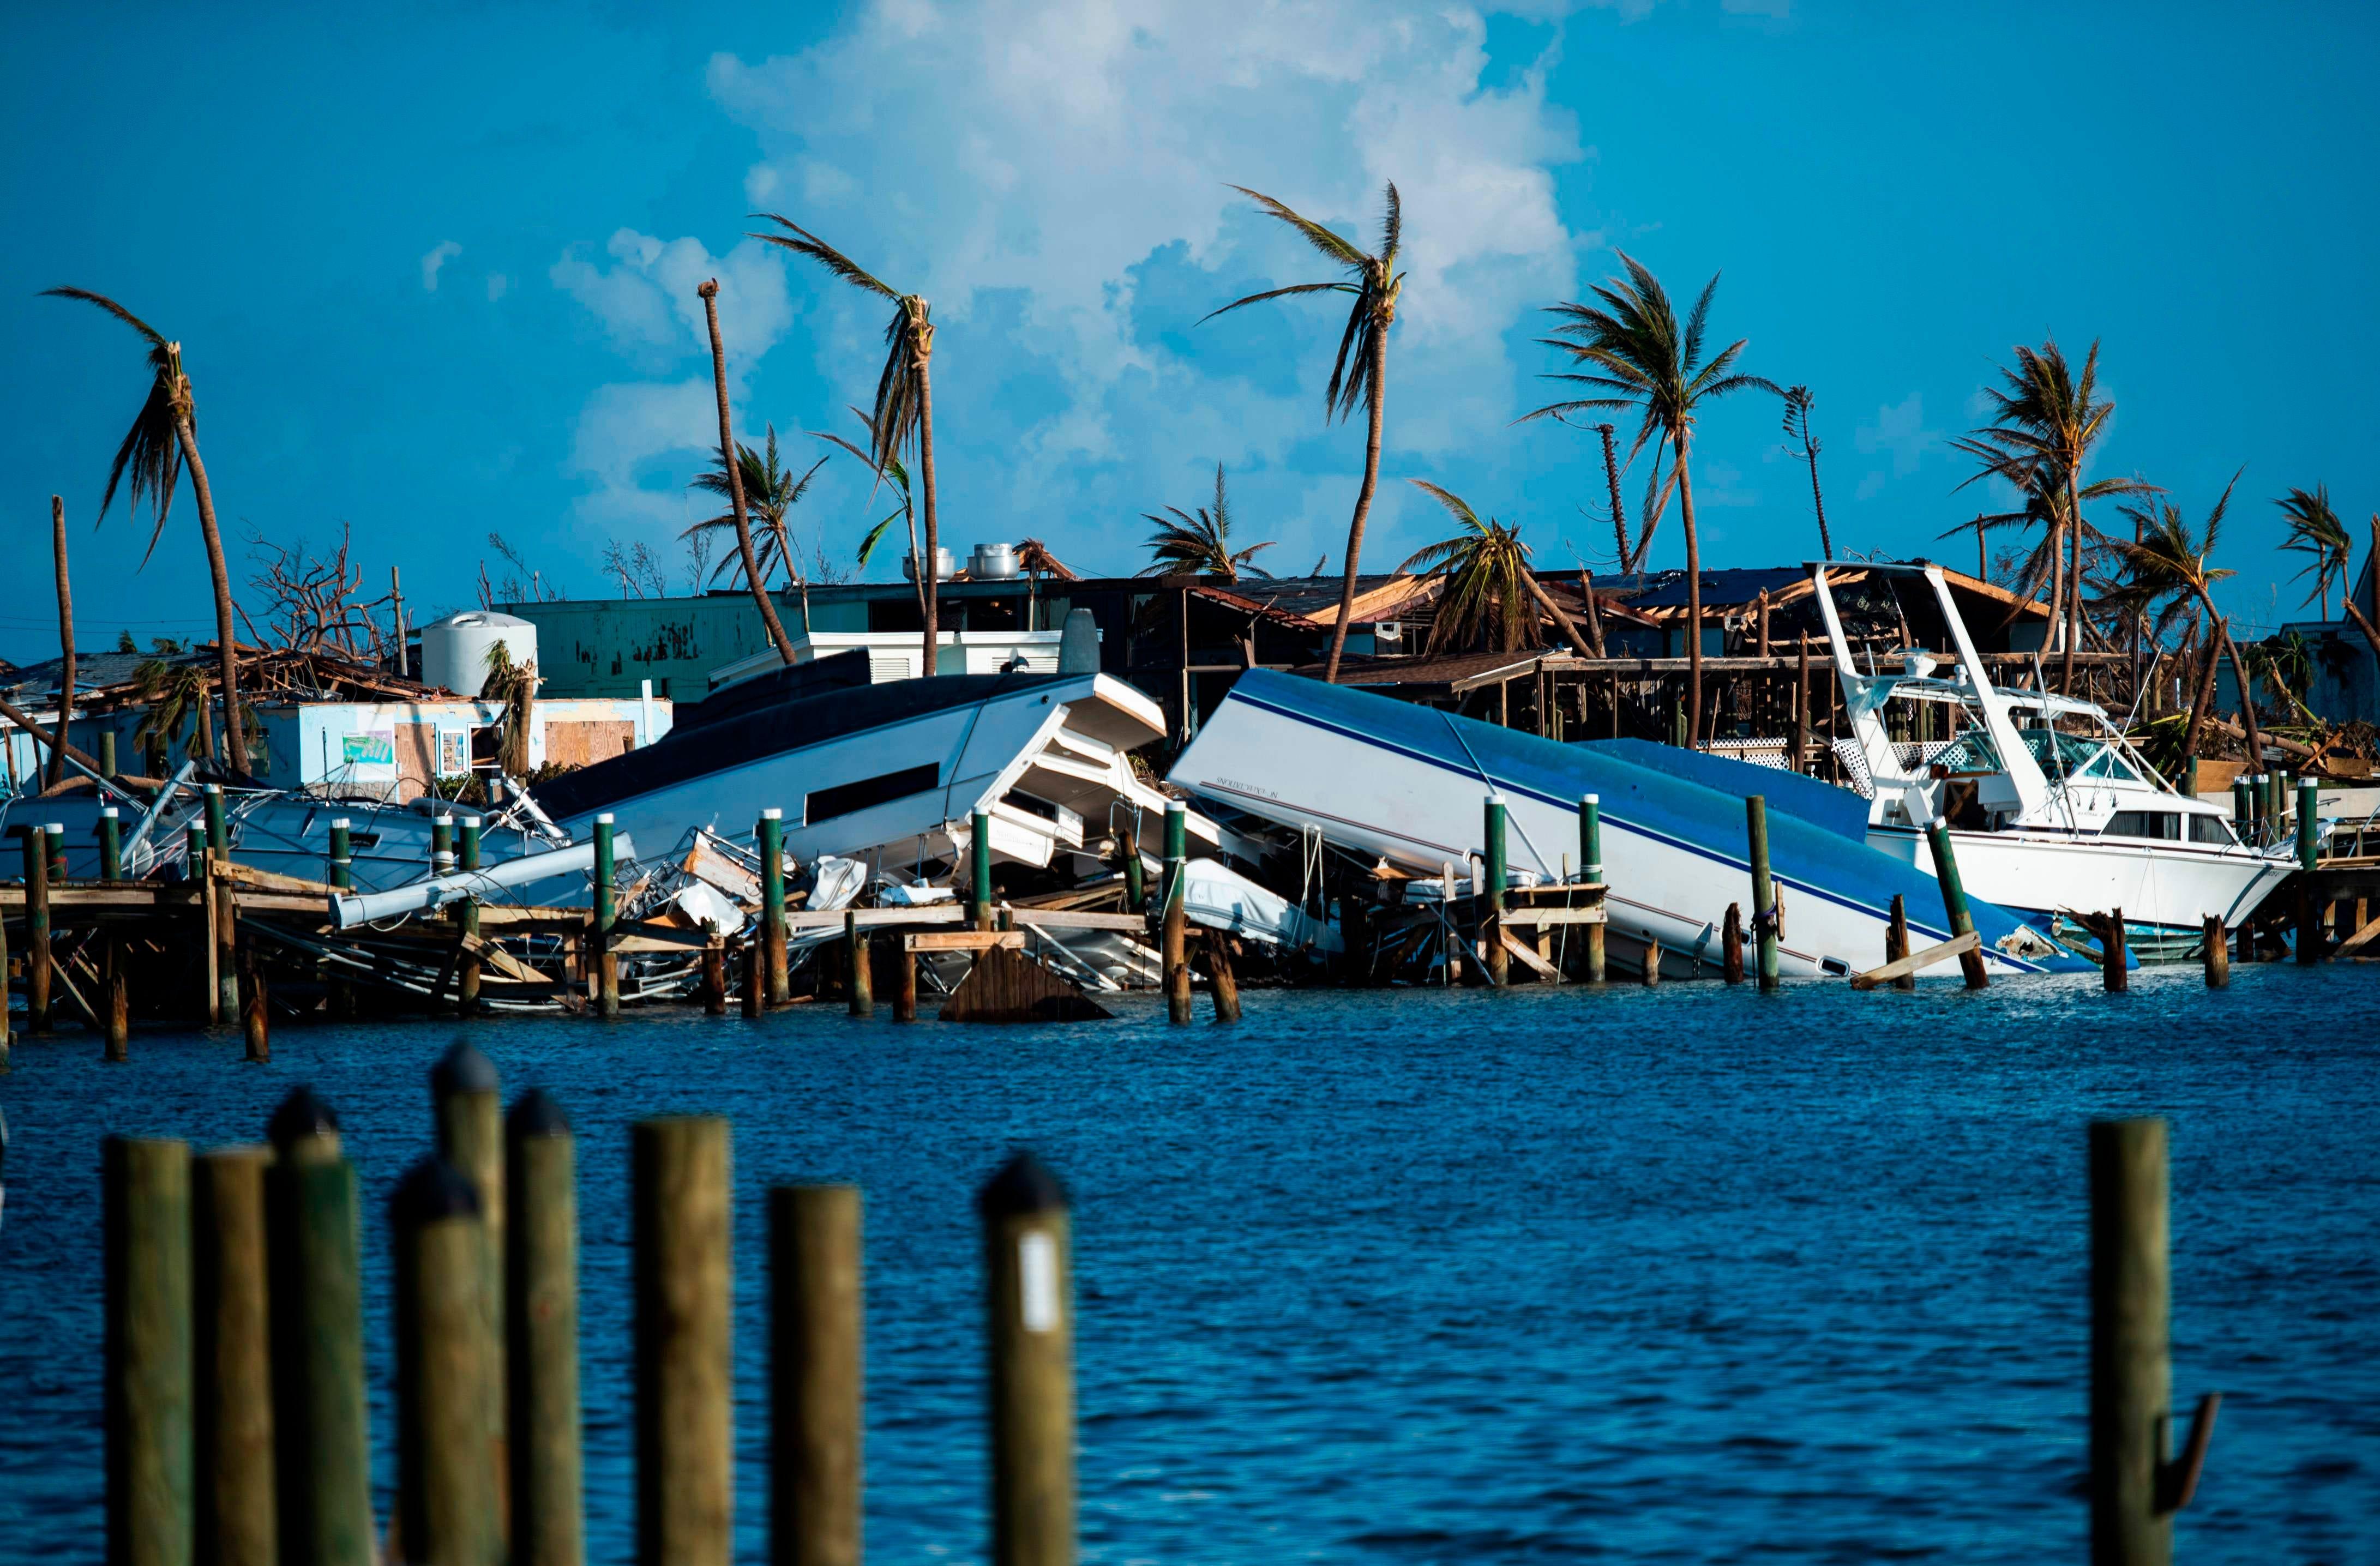 'Leave now': 1 dead as Hurricane Dorian expected to reach Carolinas late Thursday